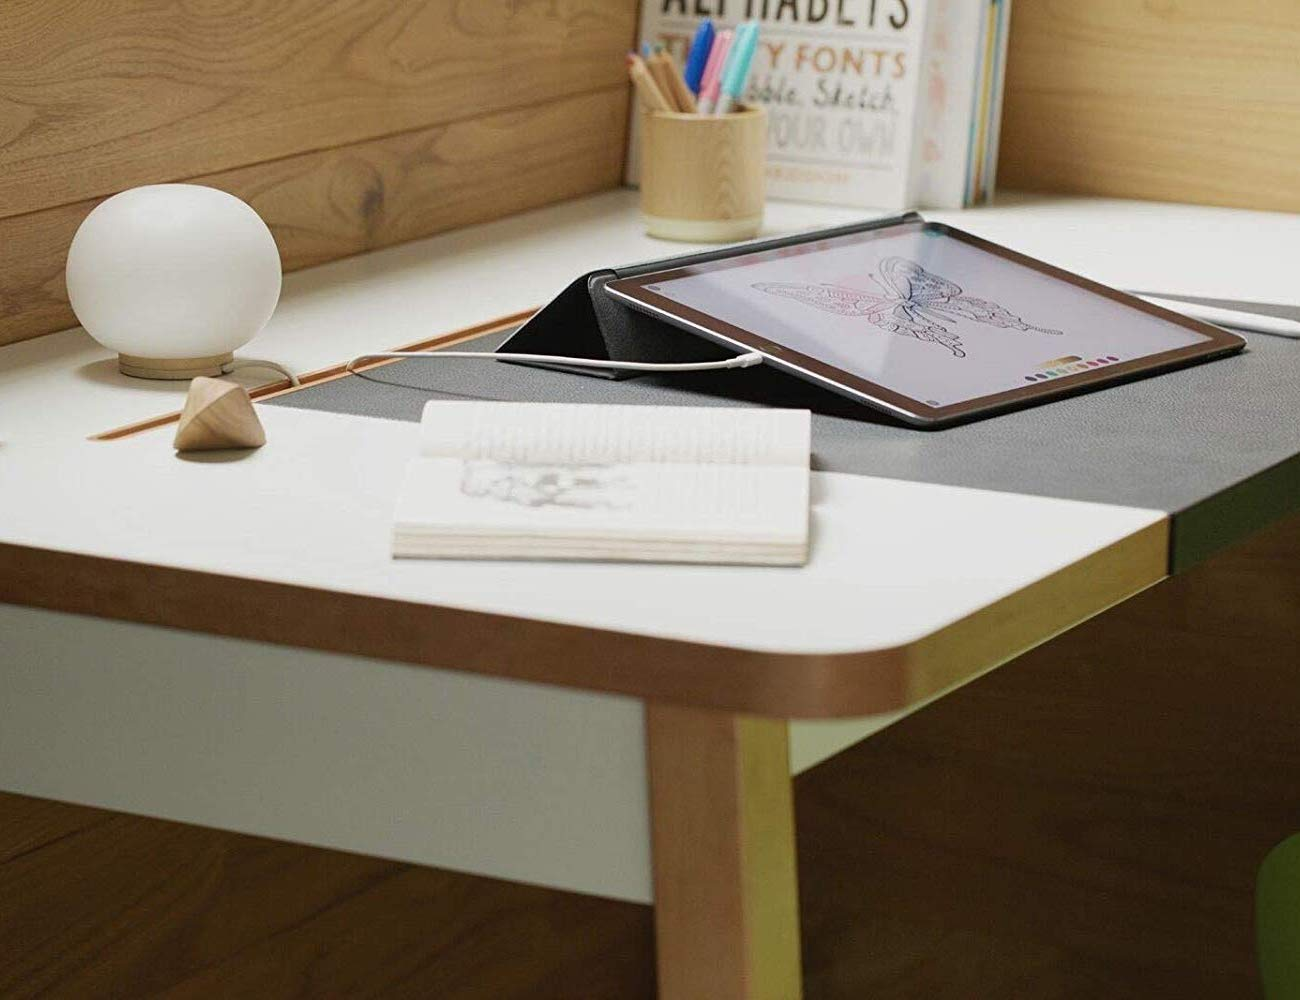 Bluelounge StudioDesk Advanced Office Desk keeps your workspace tidy